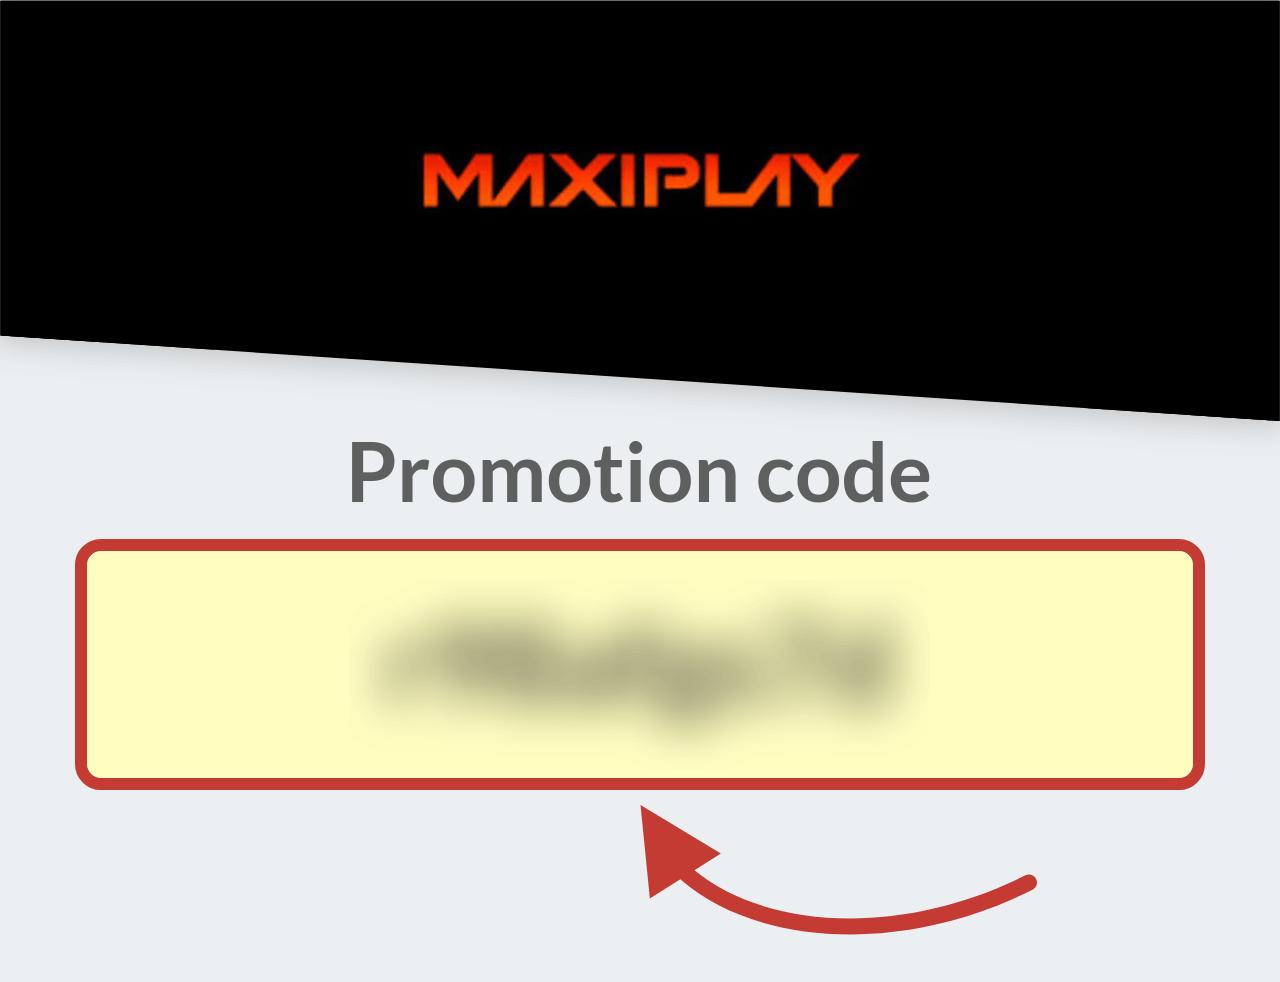 Maxiplay Promo Code